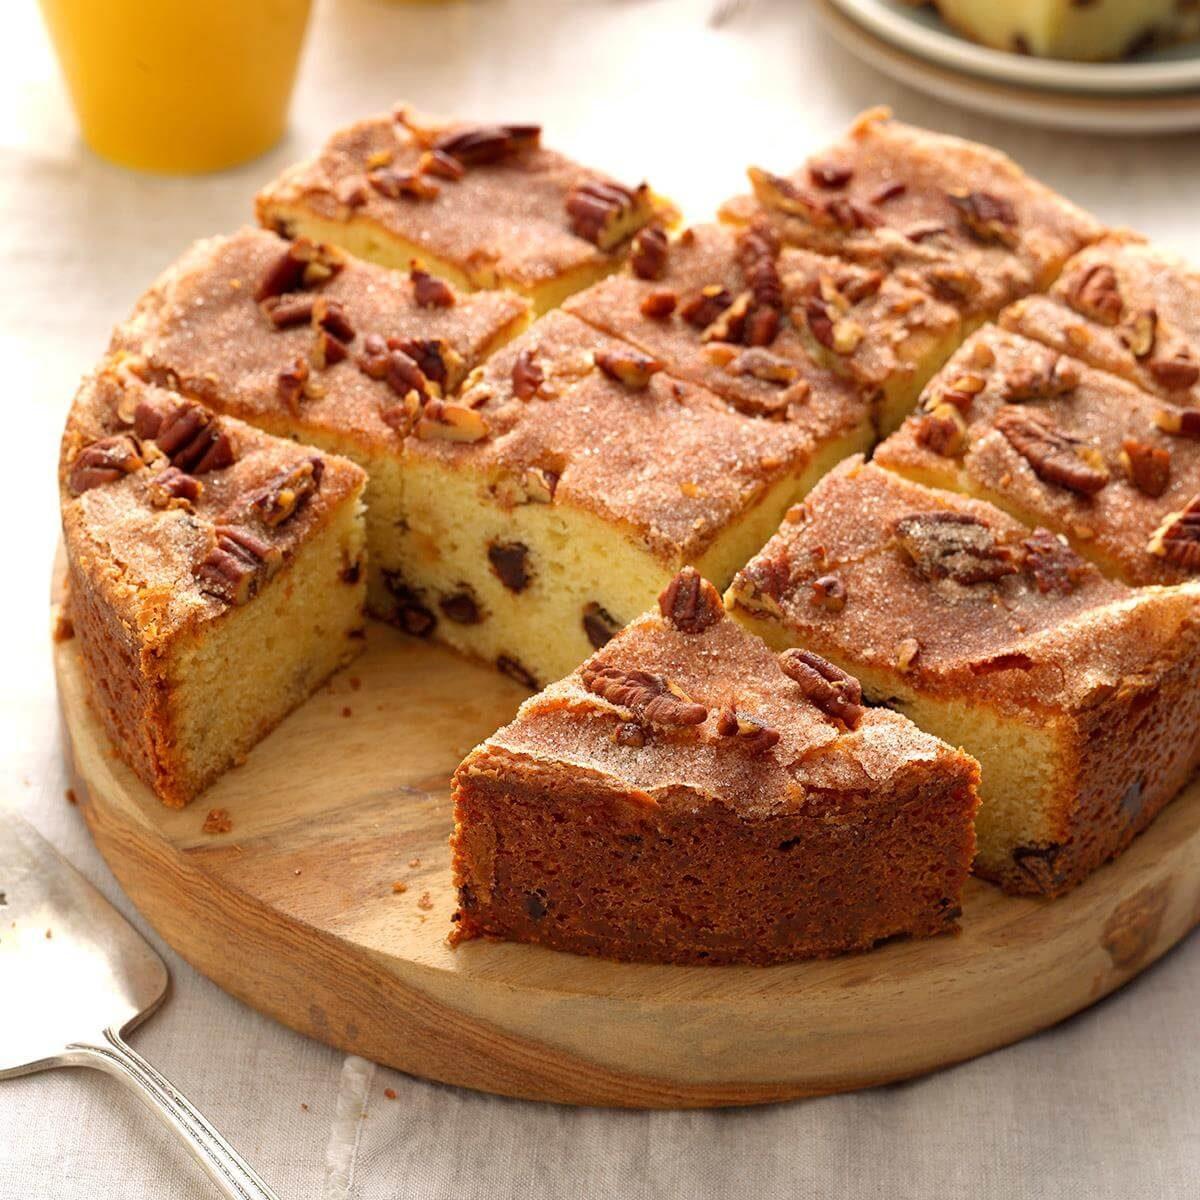 Rich Chocolate Chip Coffee Cake Recipe | Taste of Home